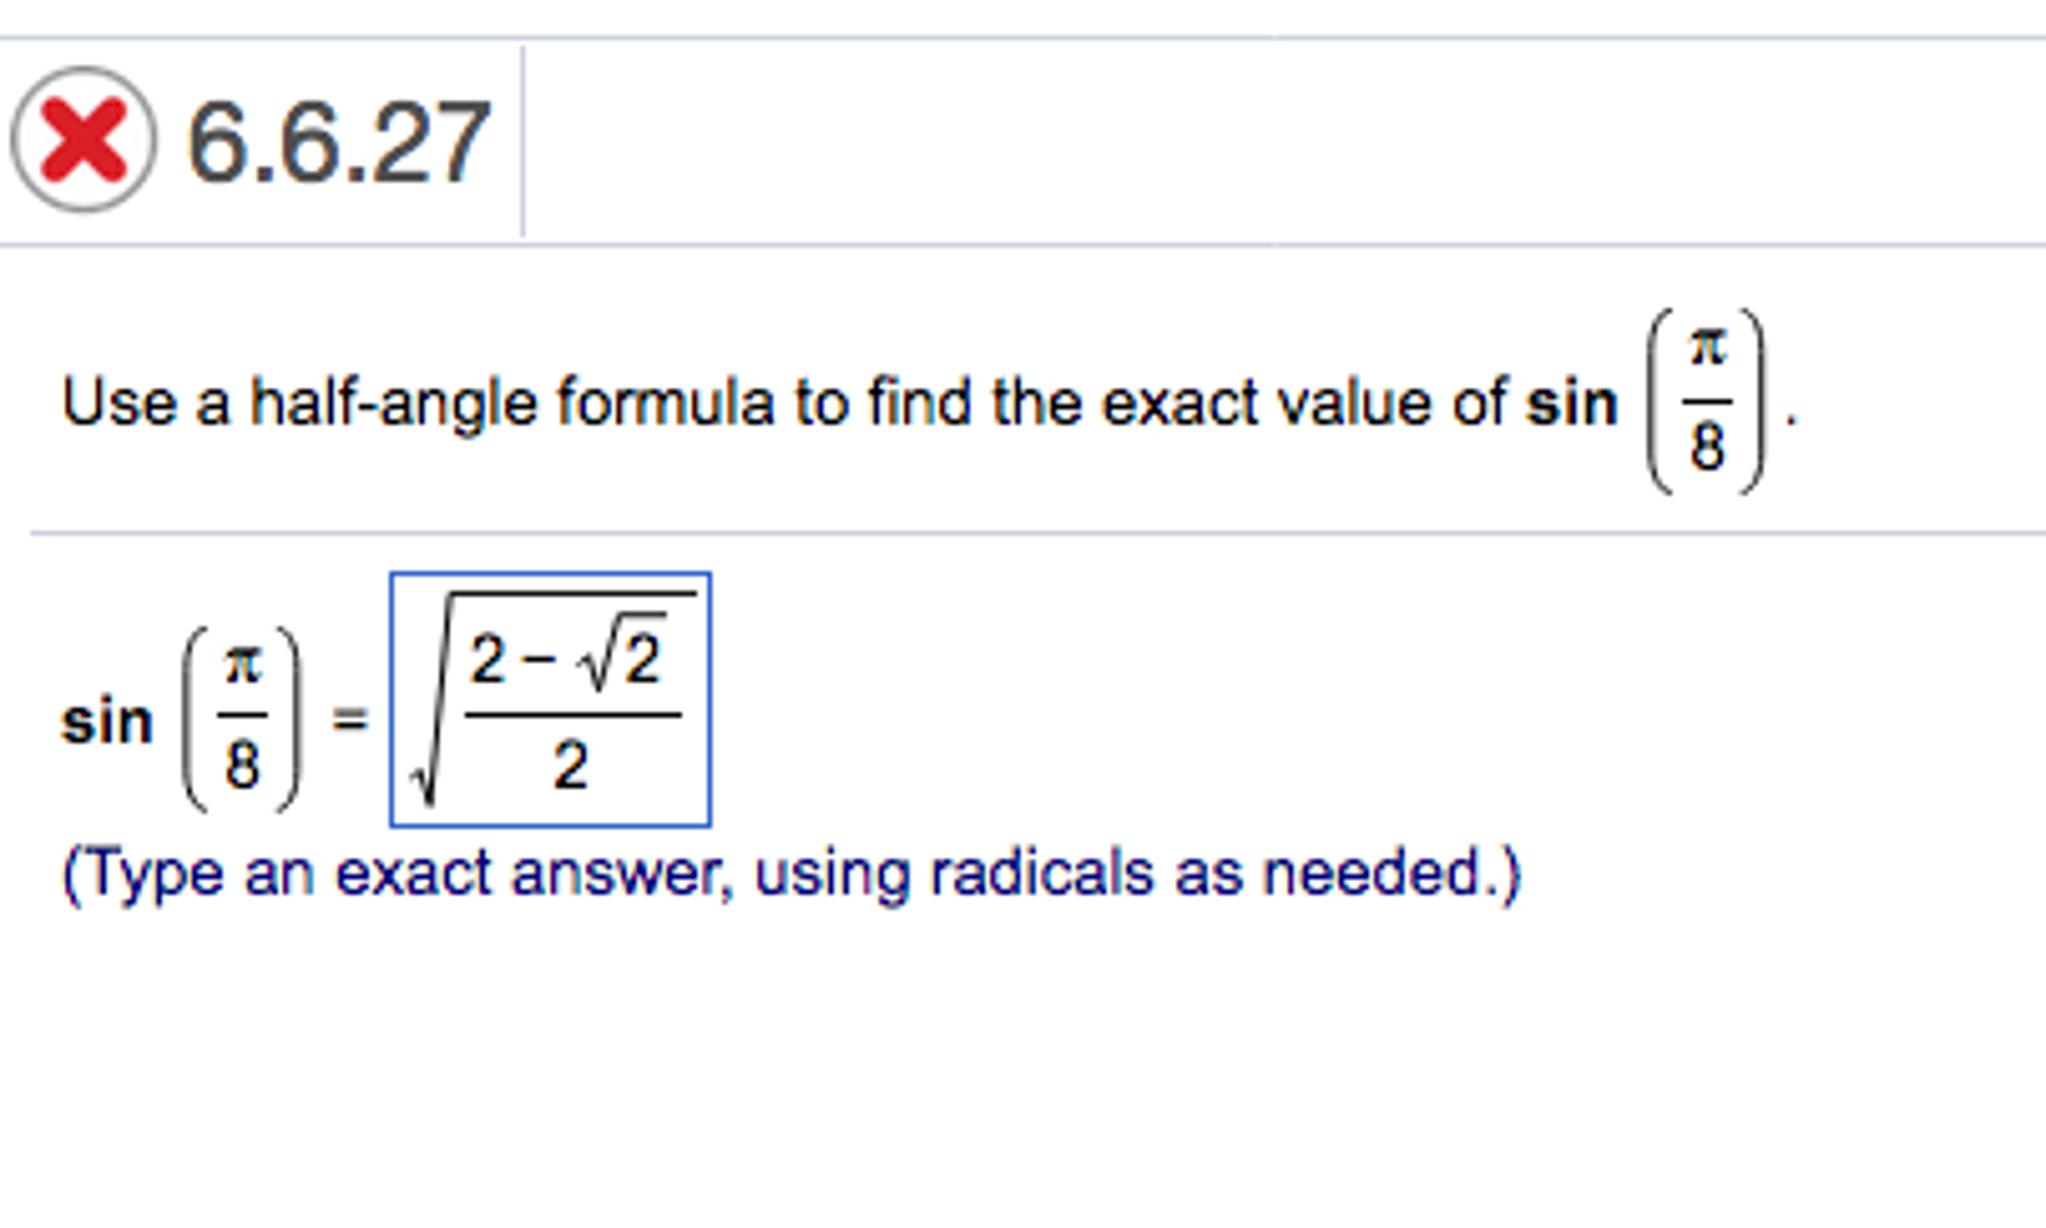 Use a half-angle formula to find the exact value o